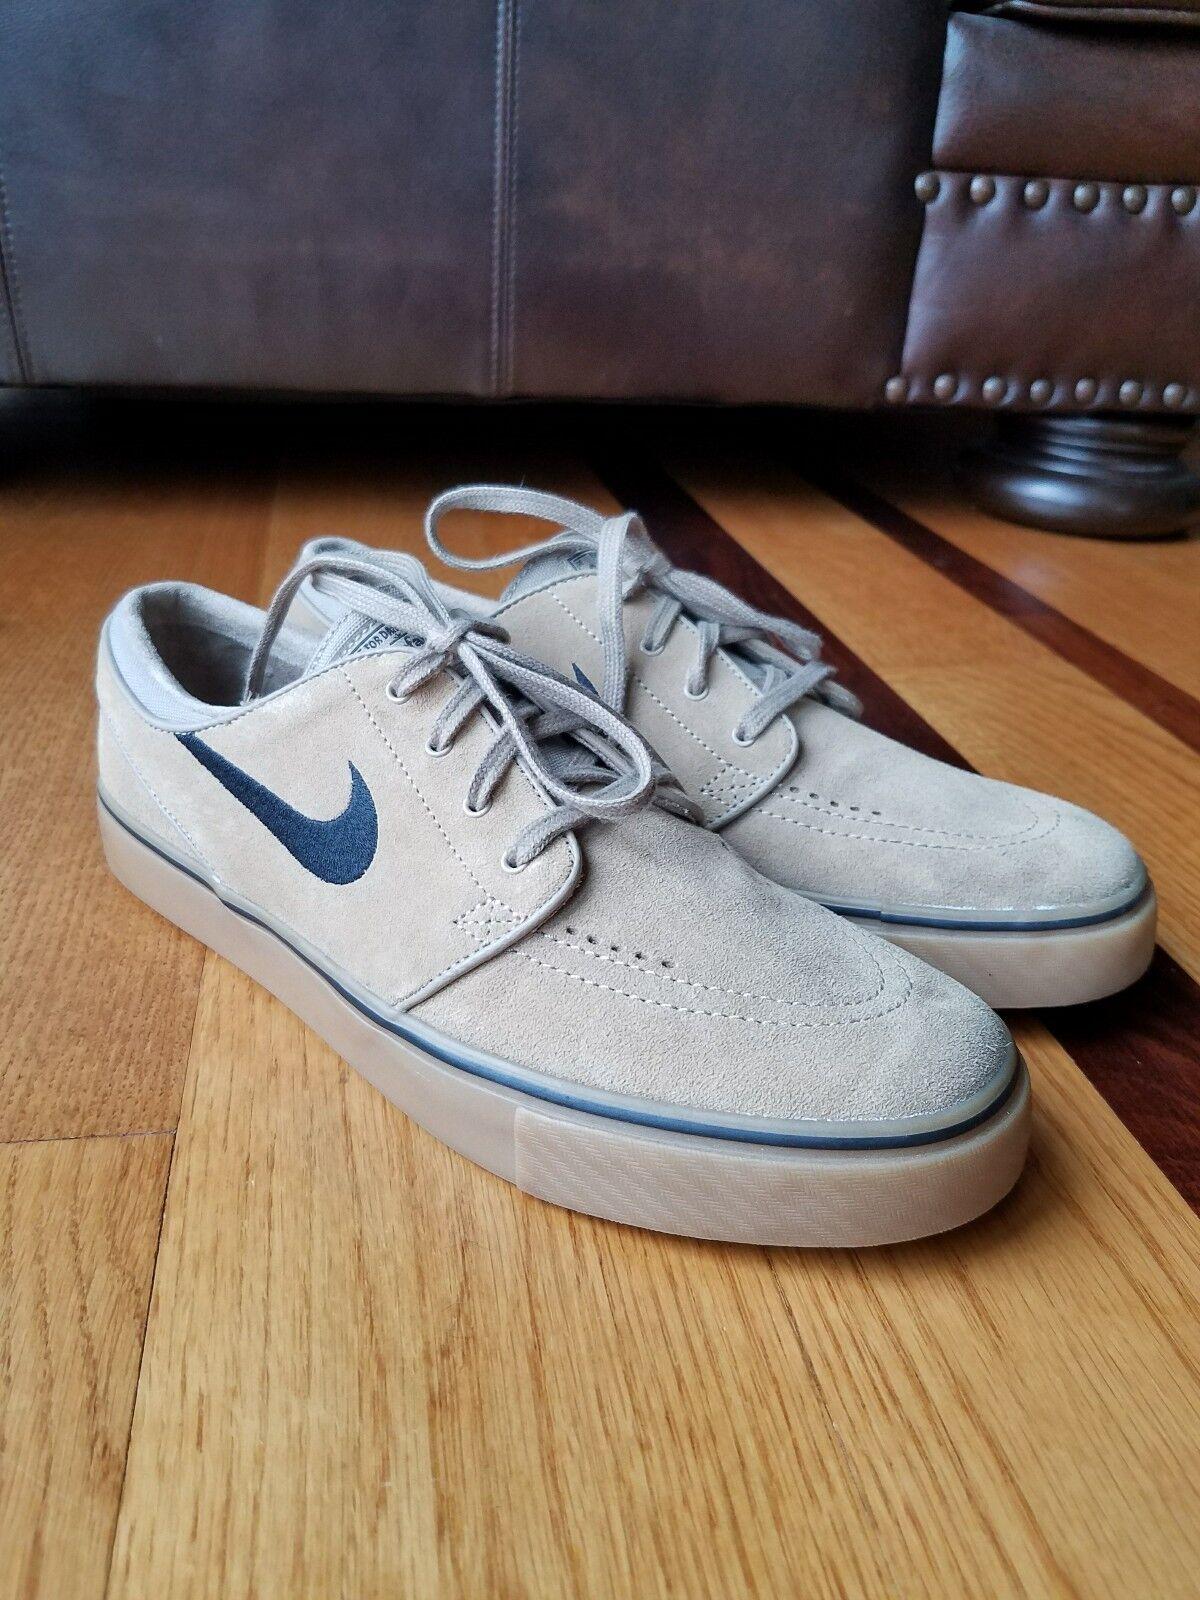 Nike SB Stefan Janoski Tan/Khaki Suede Gum Gumsole 333824-212 Size 10.5